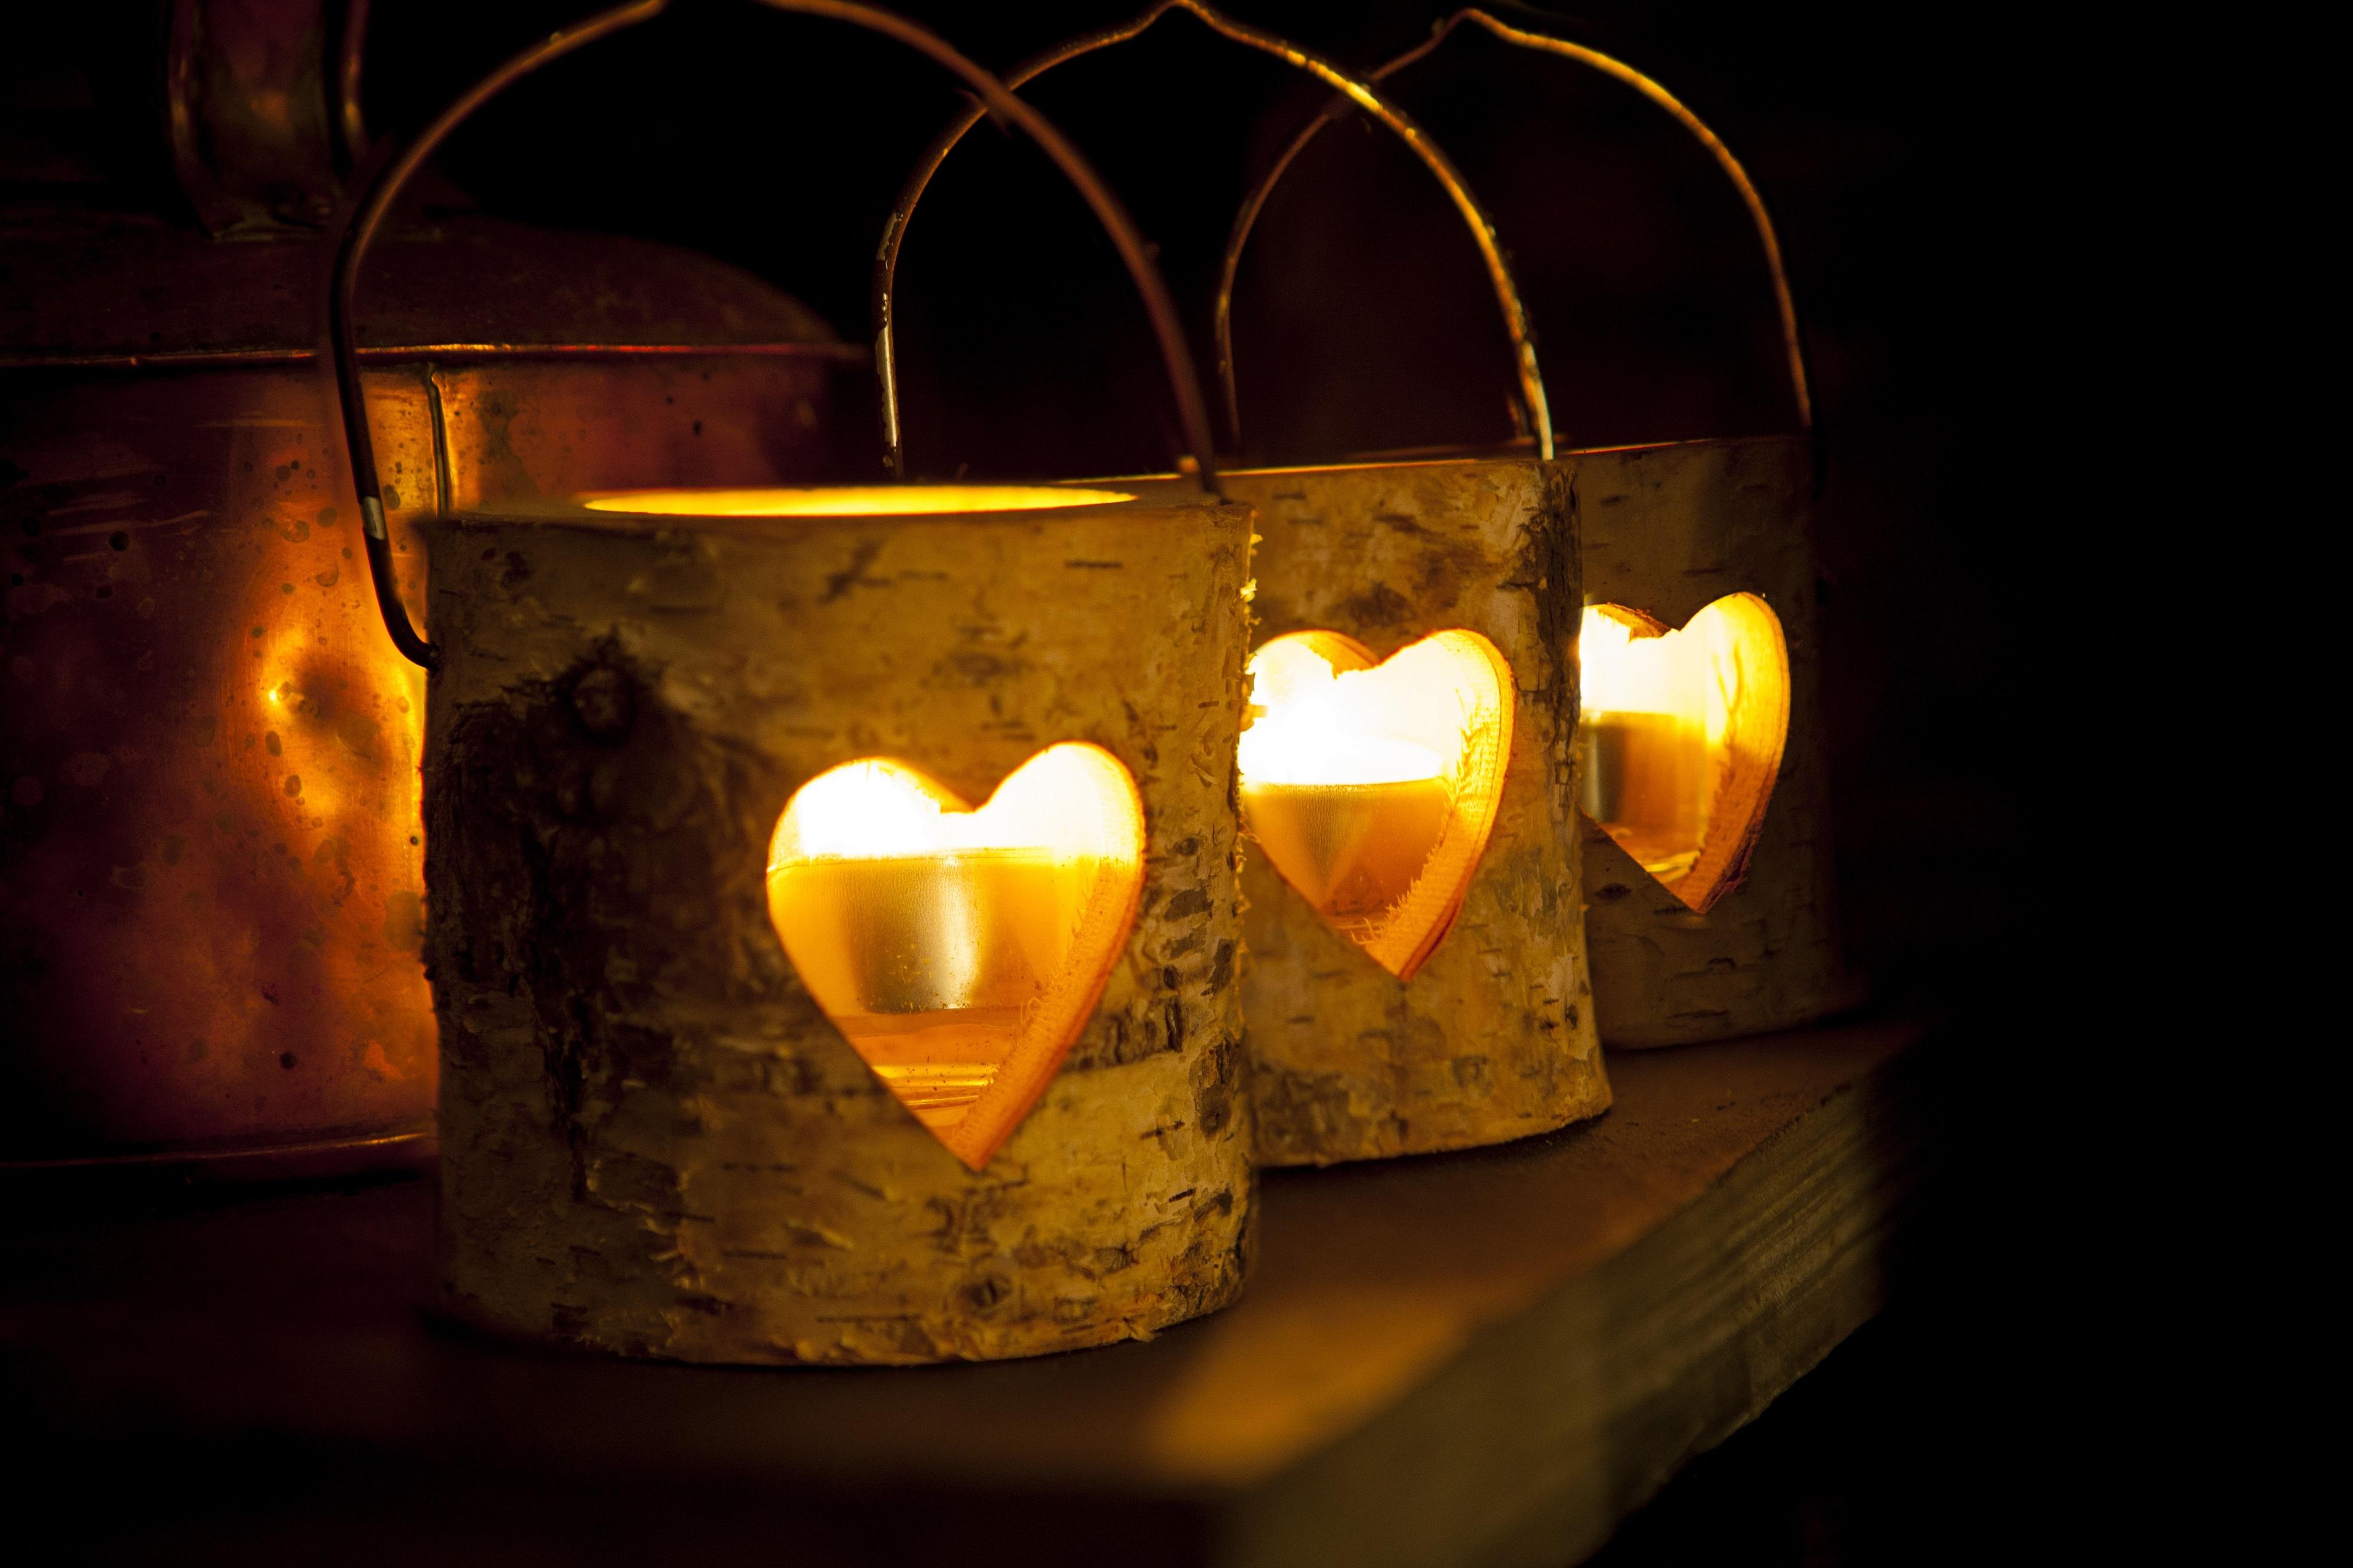 Oui Oui-Portavelas-tronco-corazón-boda rustica-boda campestre 2